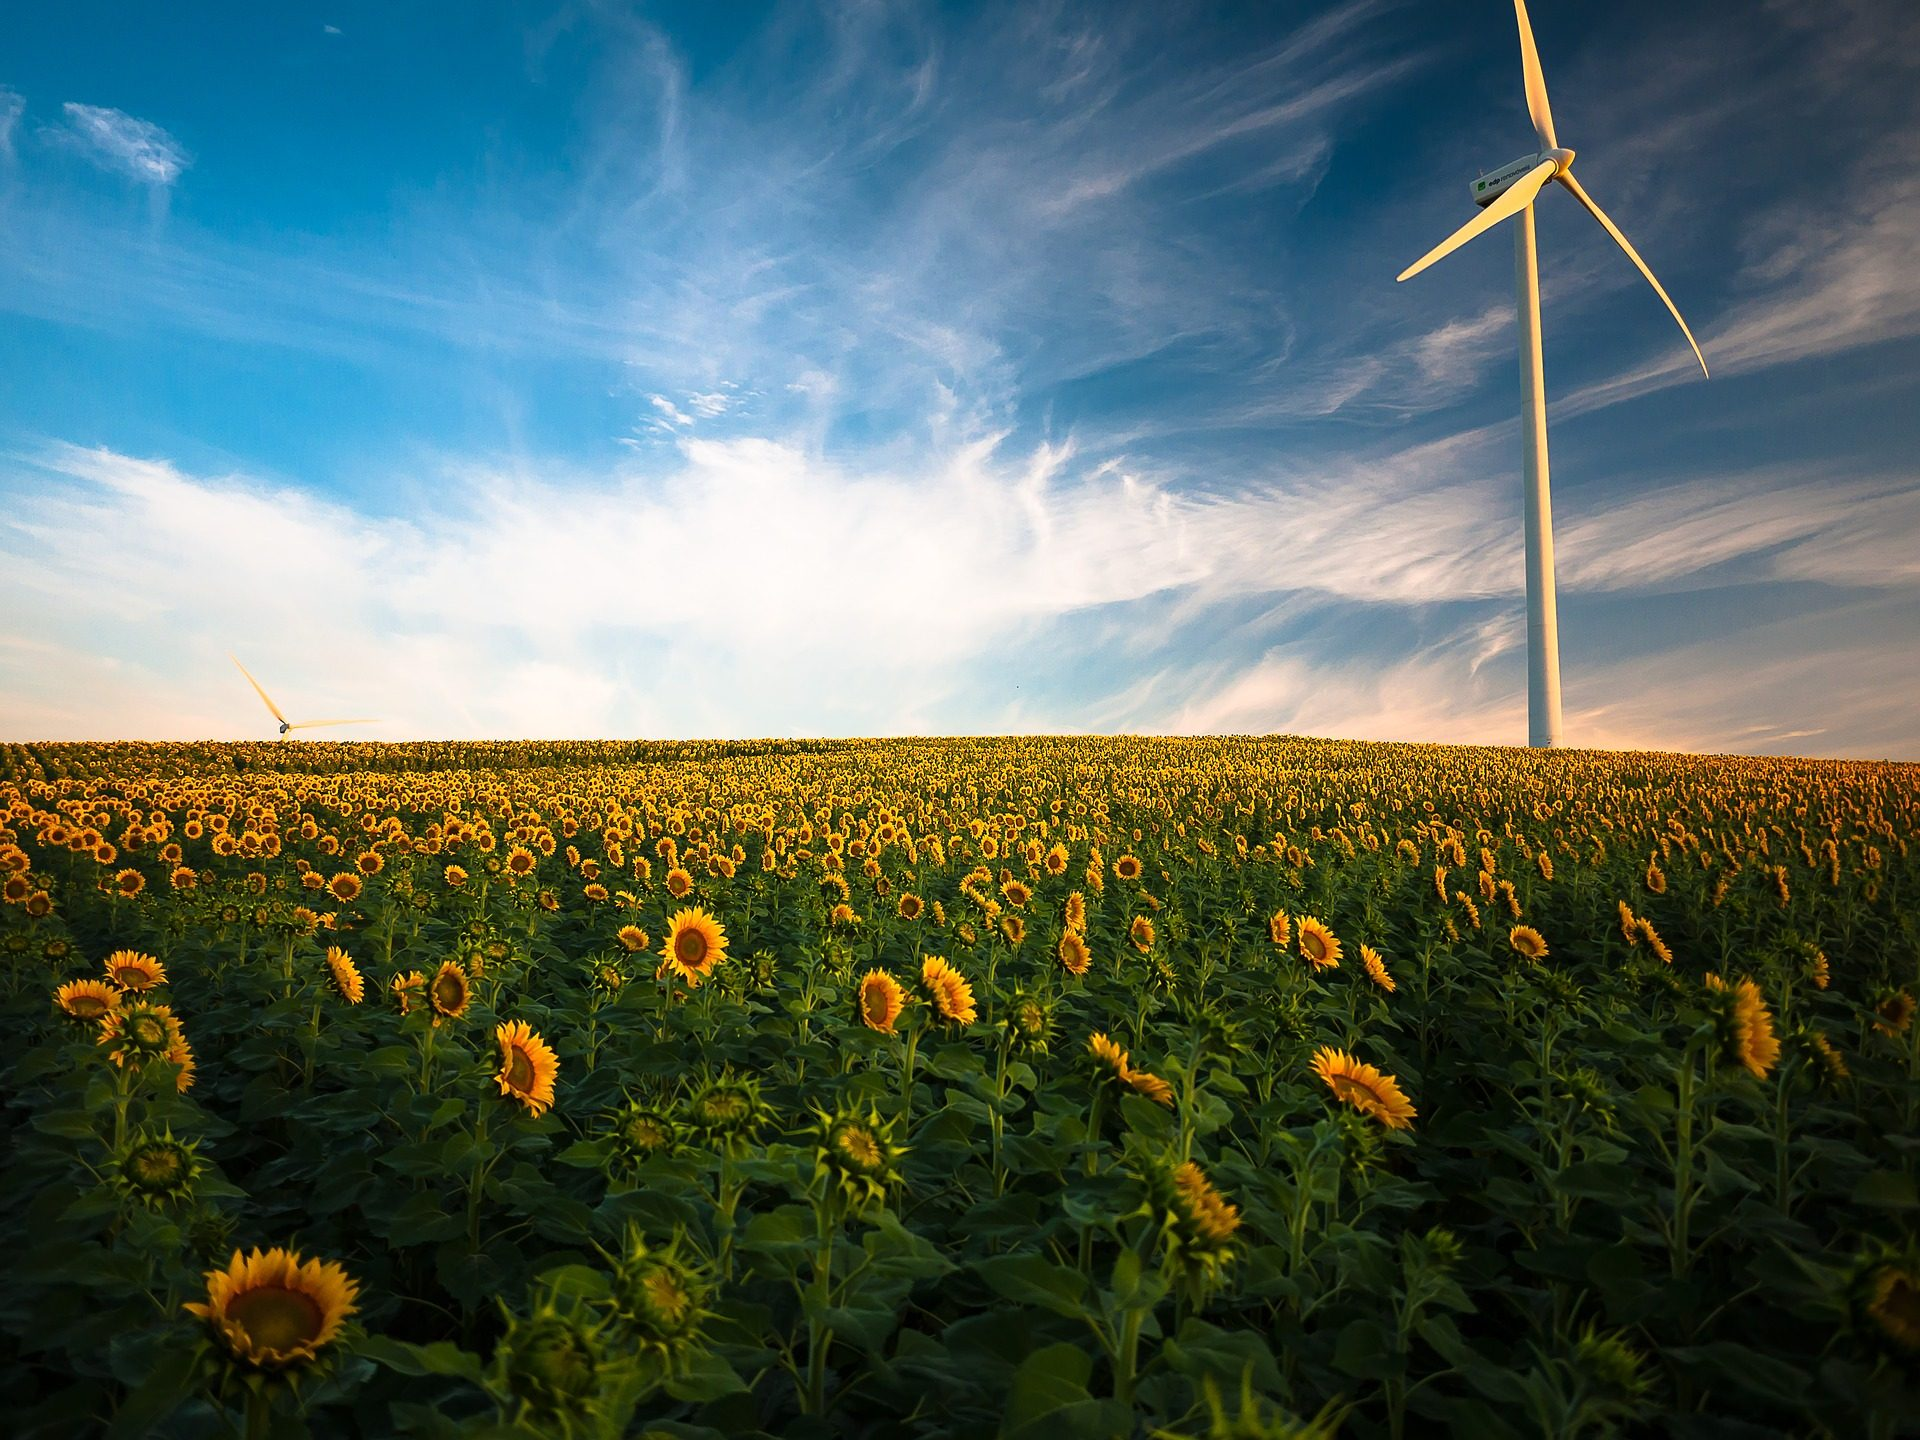 molino, campo, plantación, girasoles, cielo, nubes - Fondos de Pantalla HD - professor-falken.com